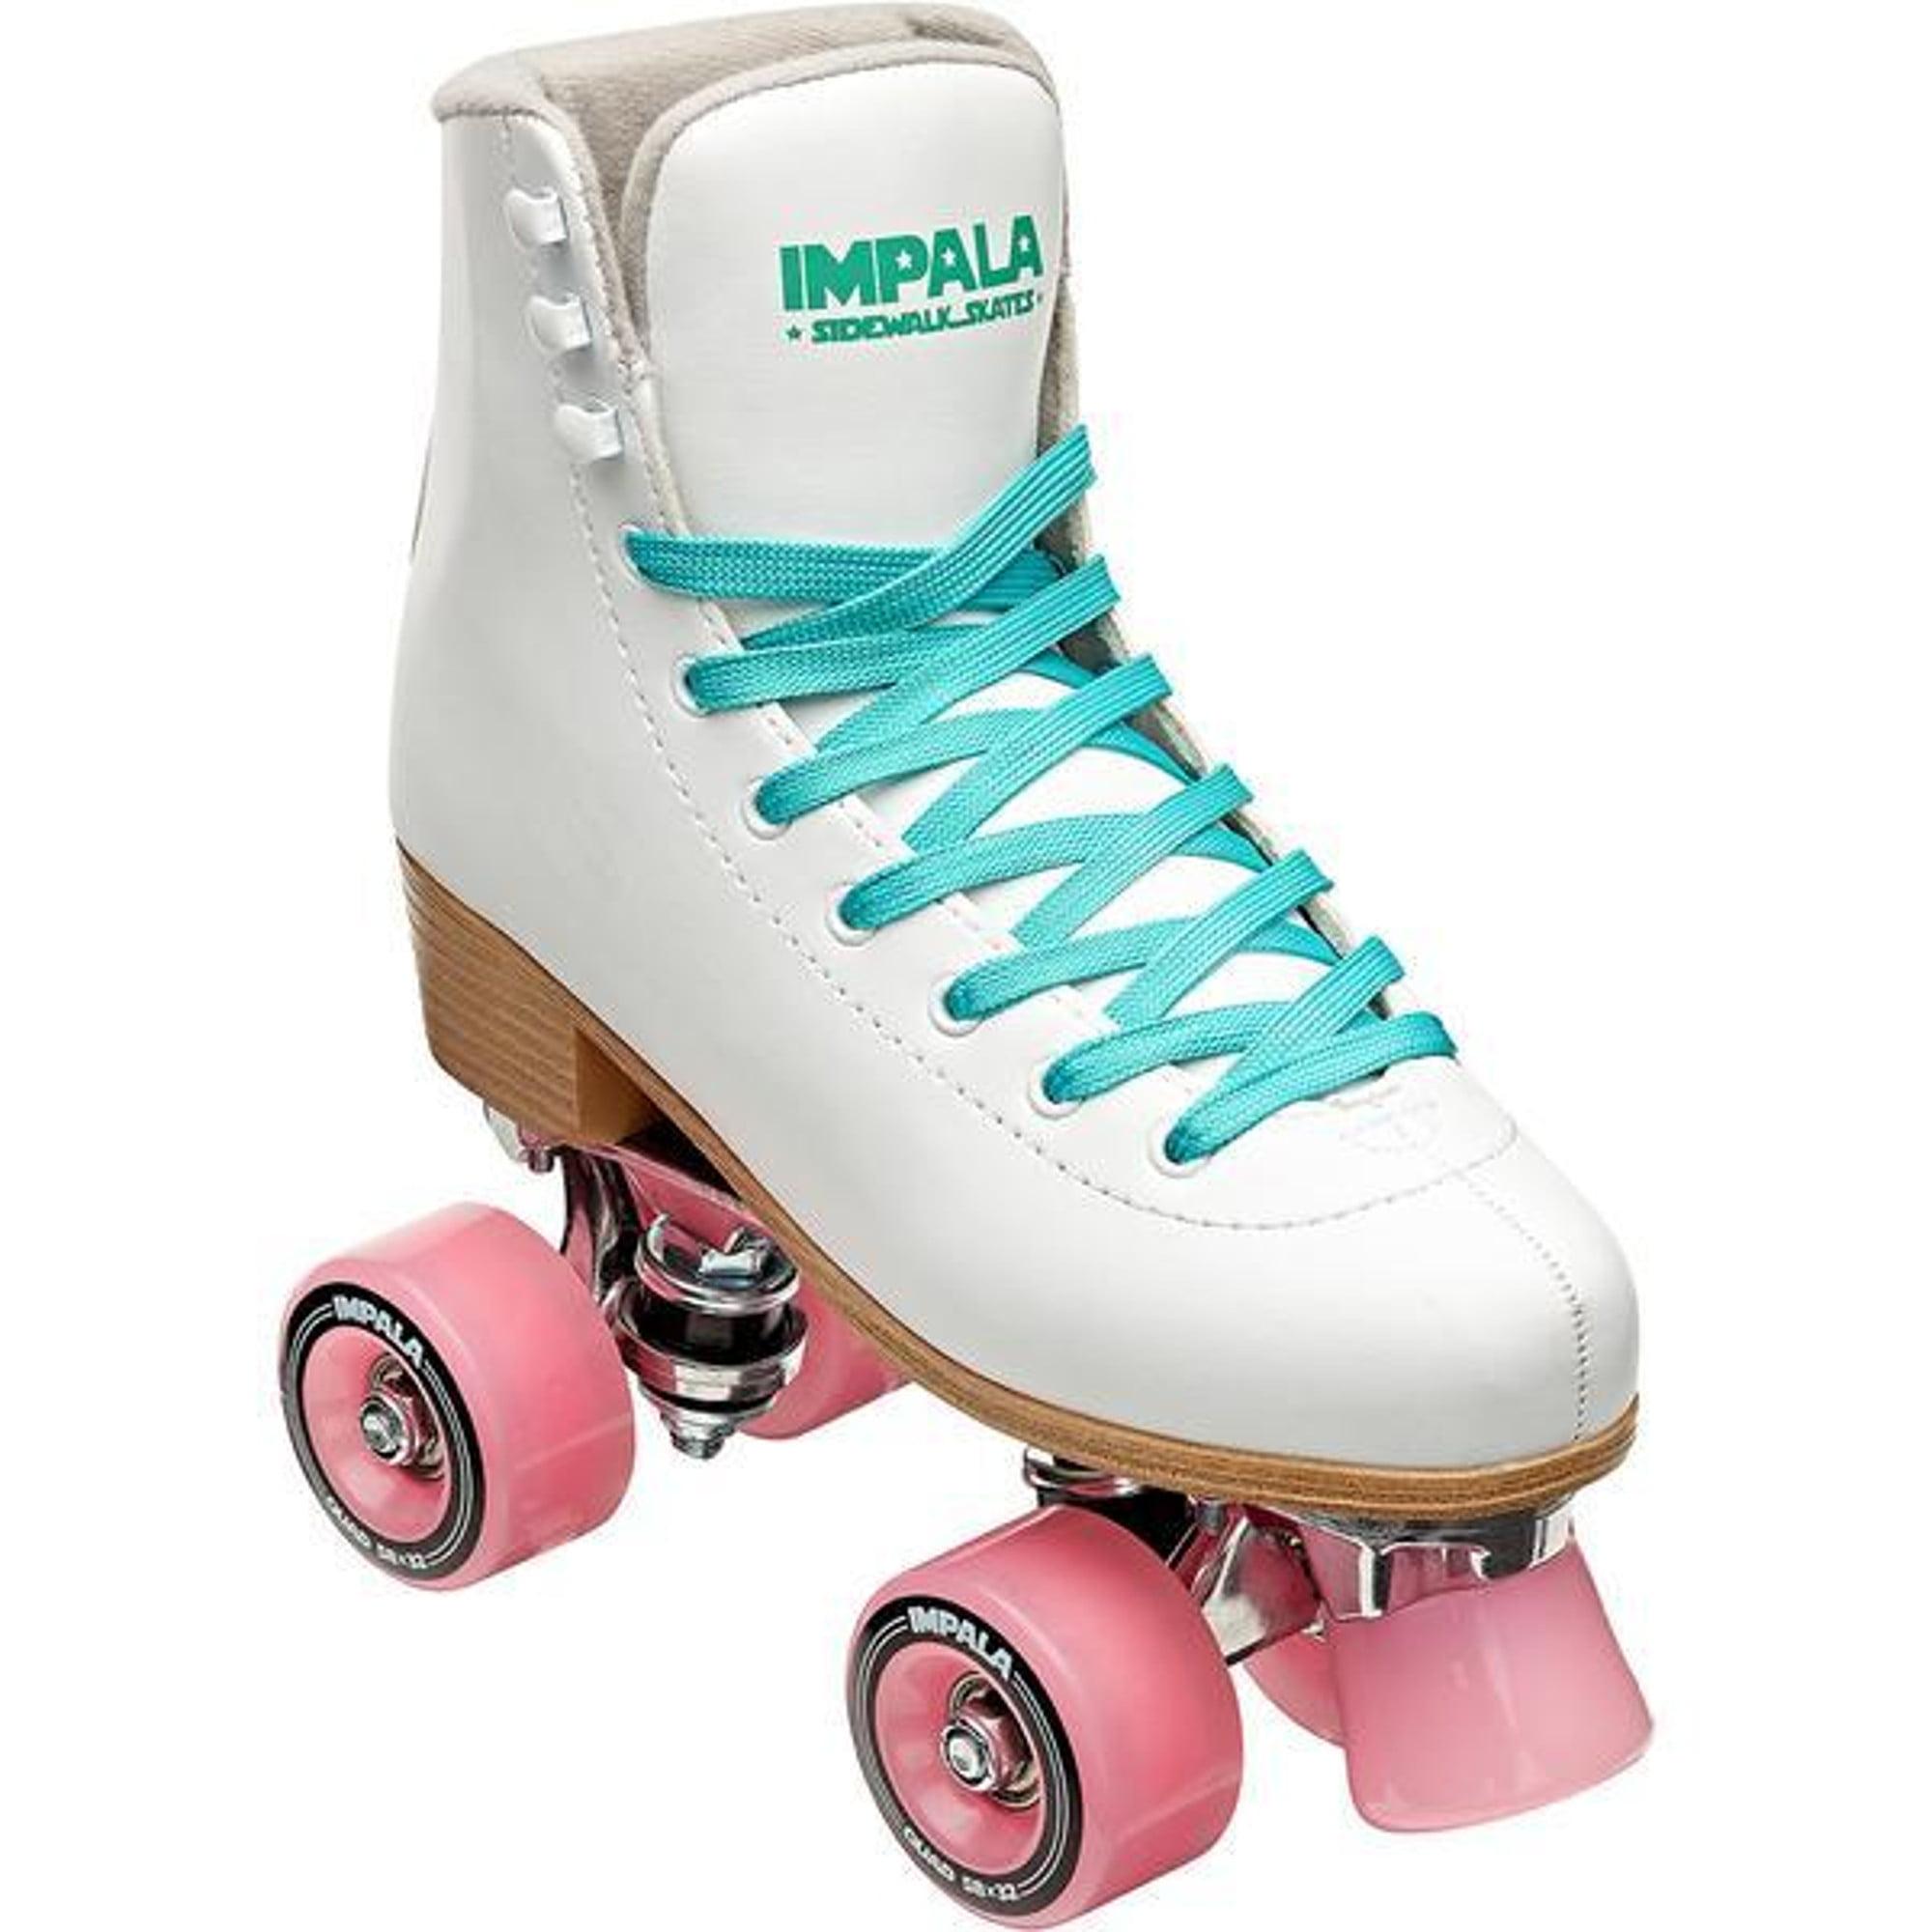 Size: 9 WomensLeopard Quad Roller SkatesVegan Impala